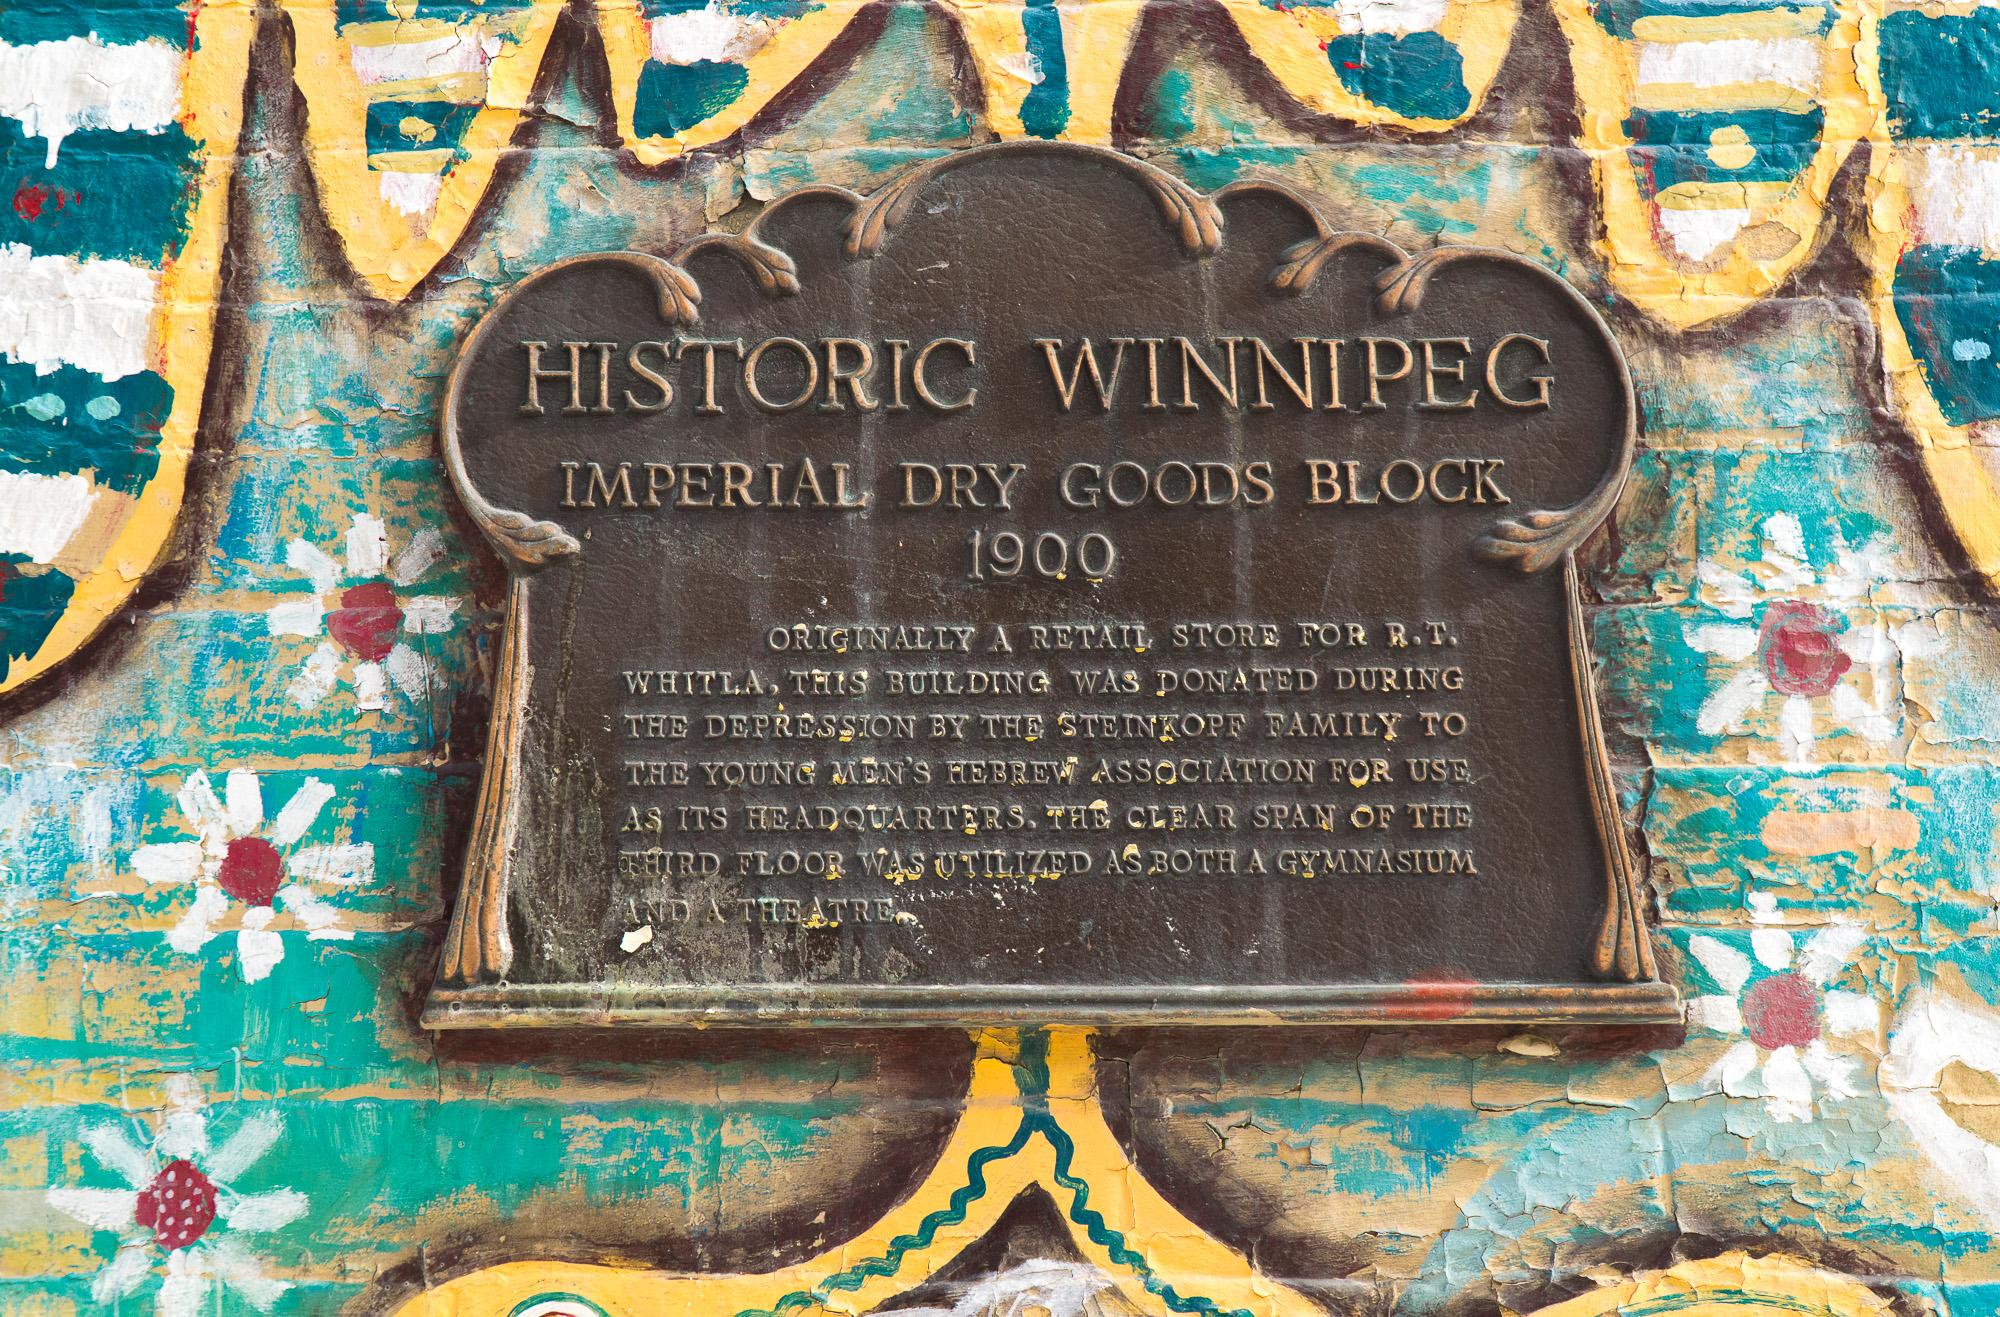 Enseigne Winnipeg historique - Street art